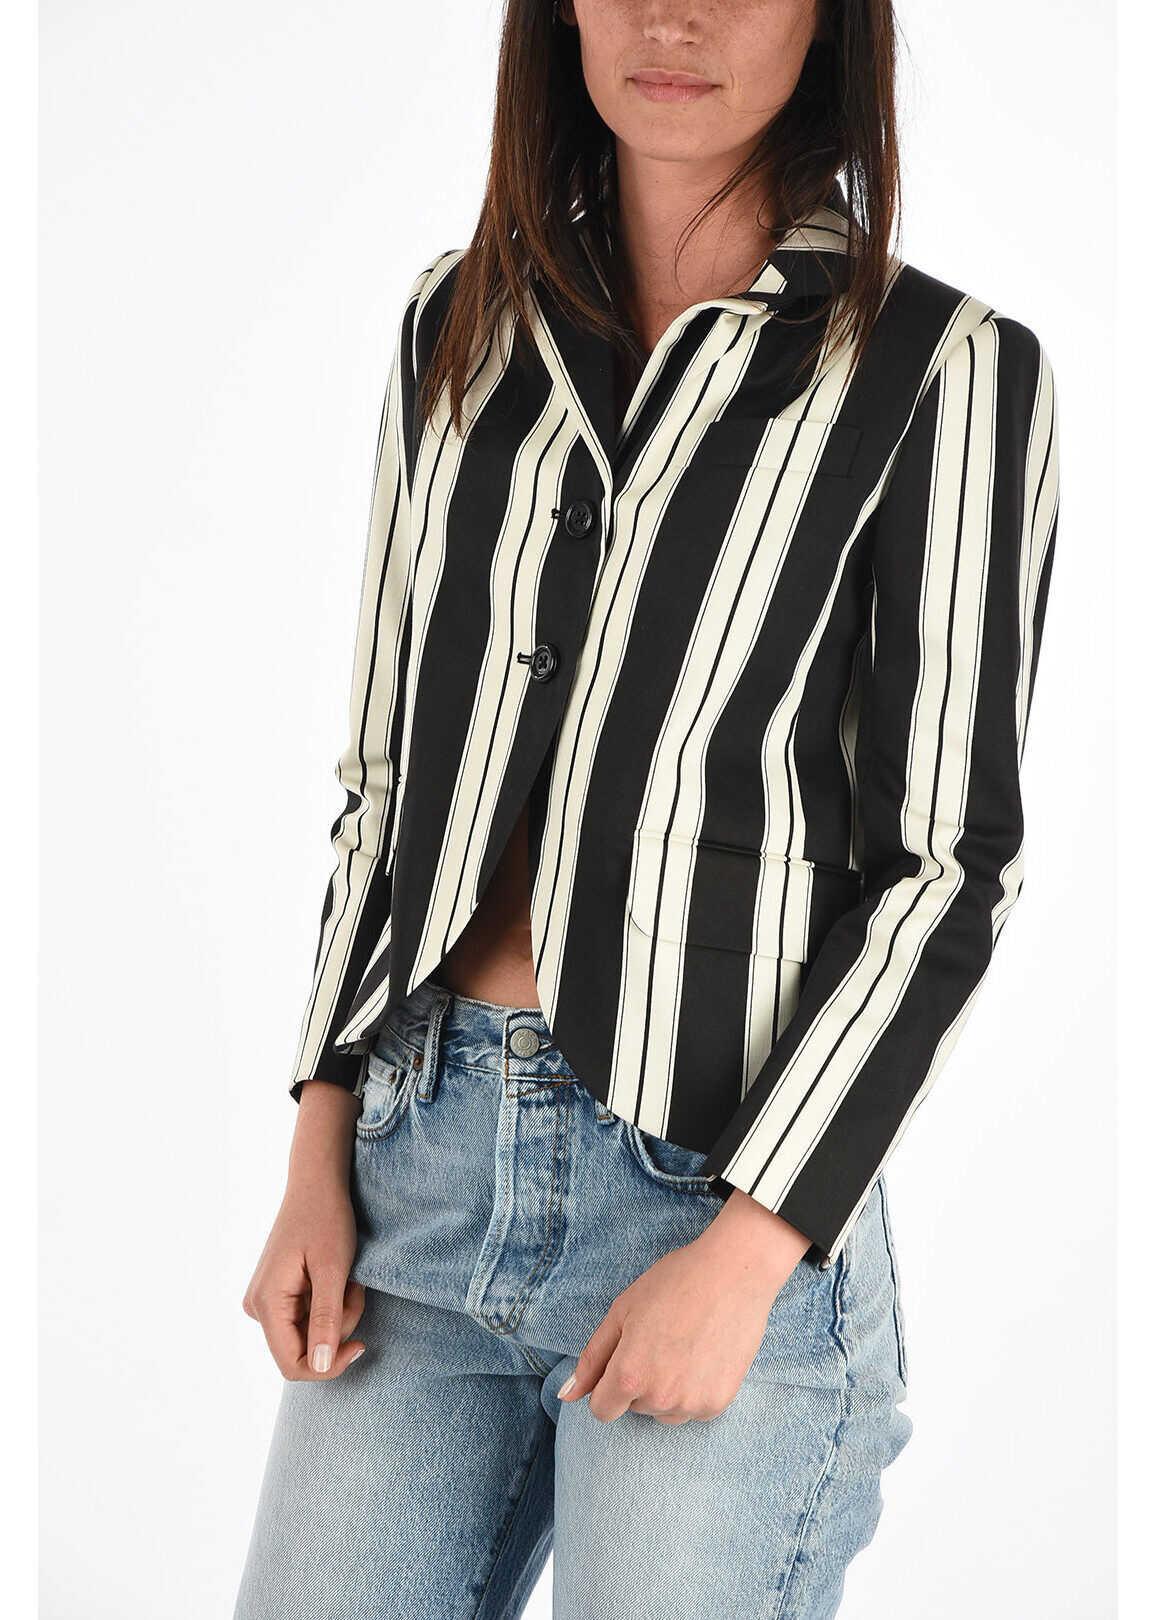 Marc Jacobs REDUX GRUNGE Striped Blazer BLACK & WHITE